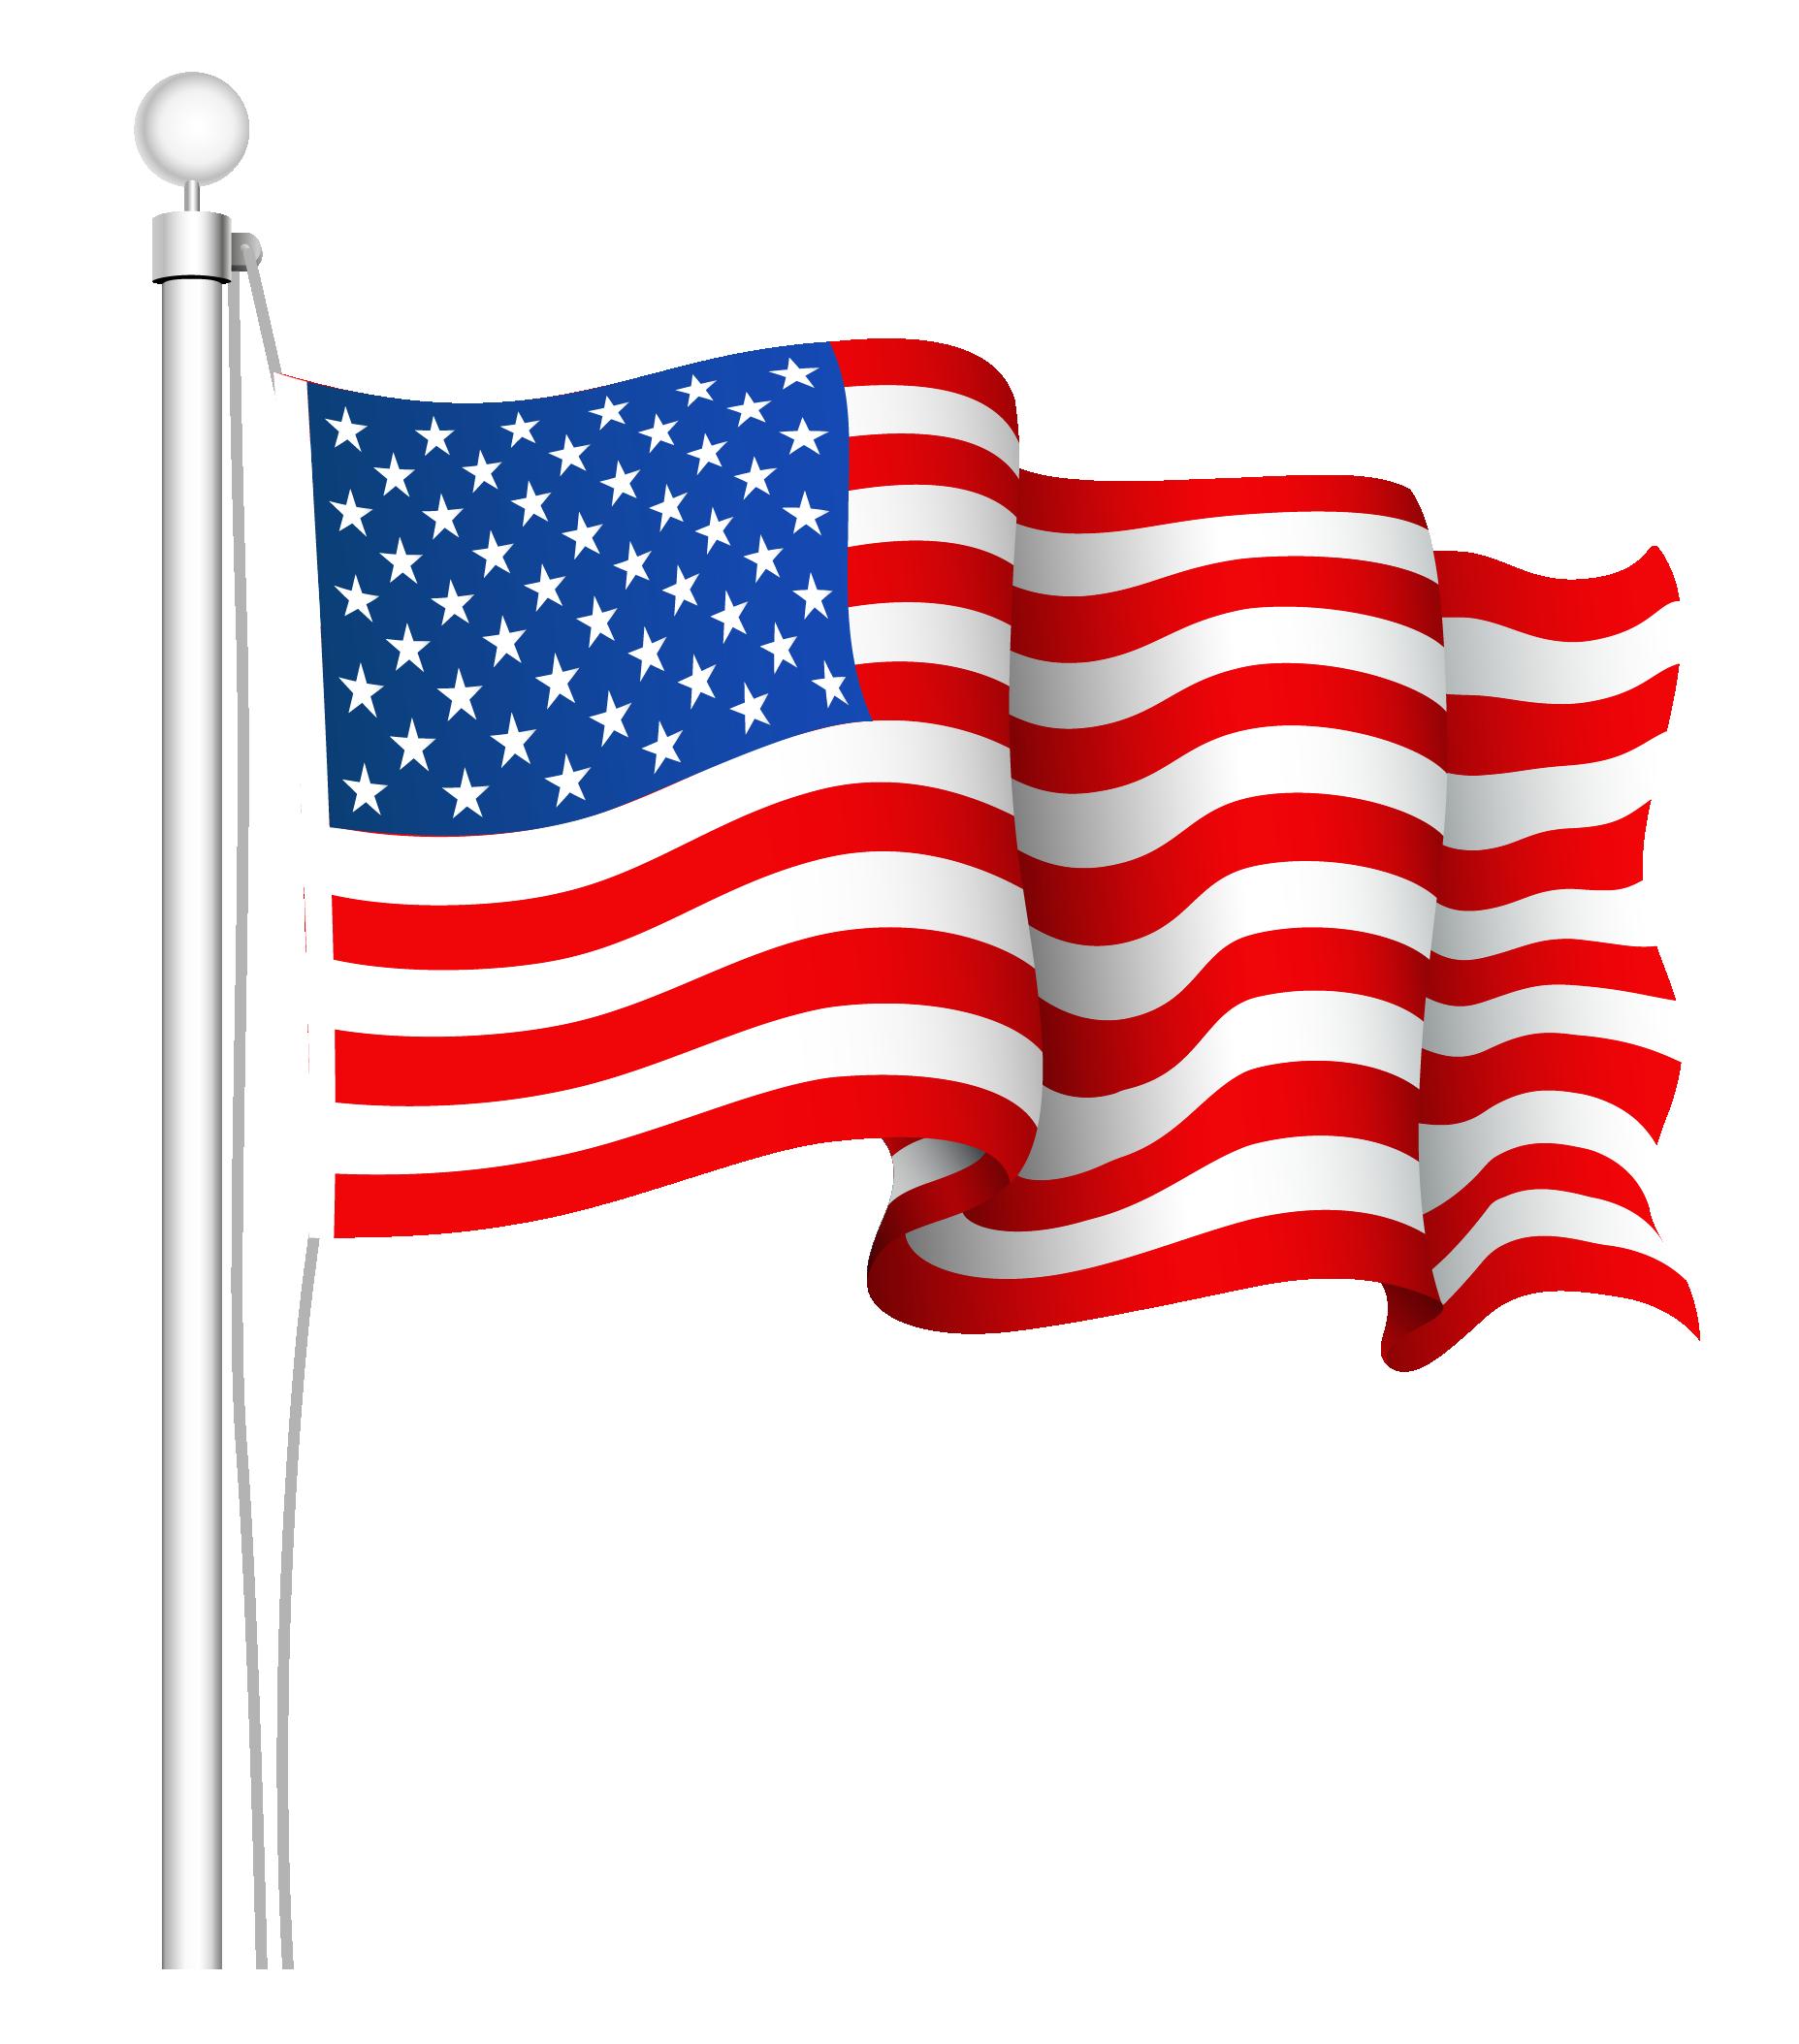 American flag united states .